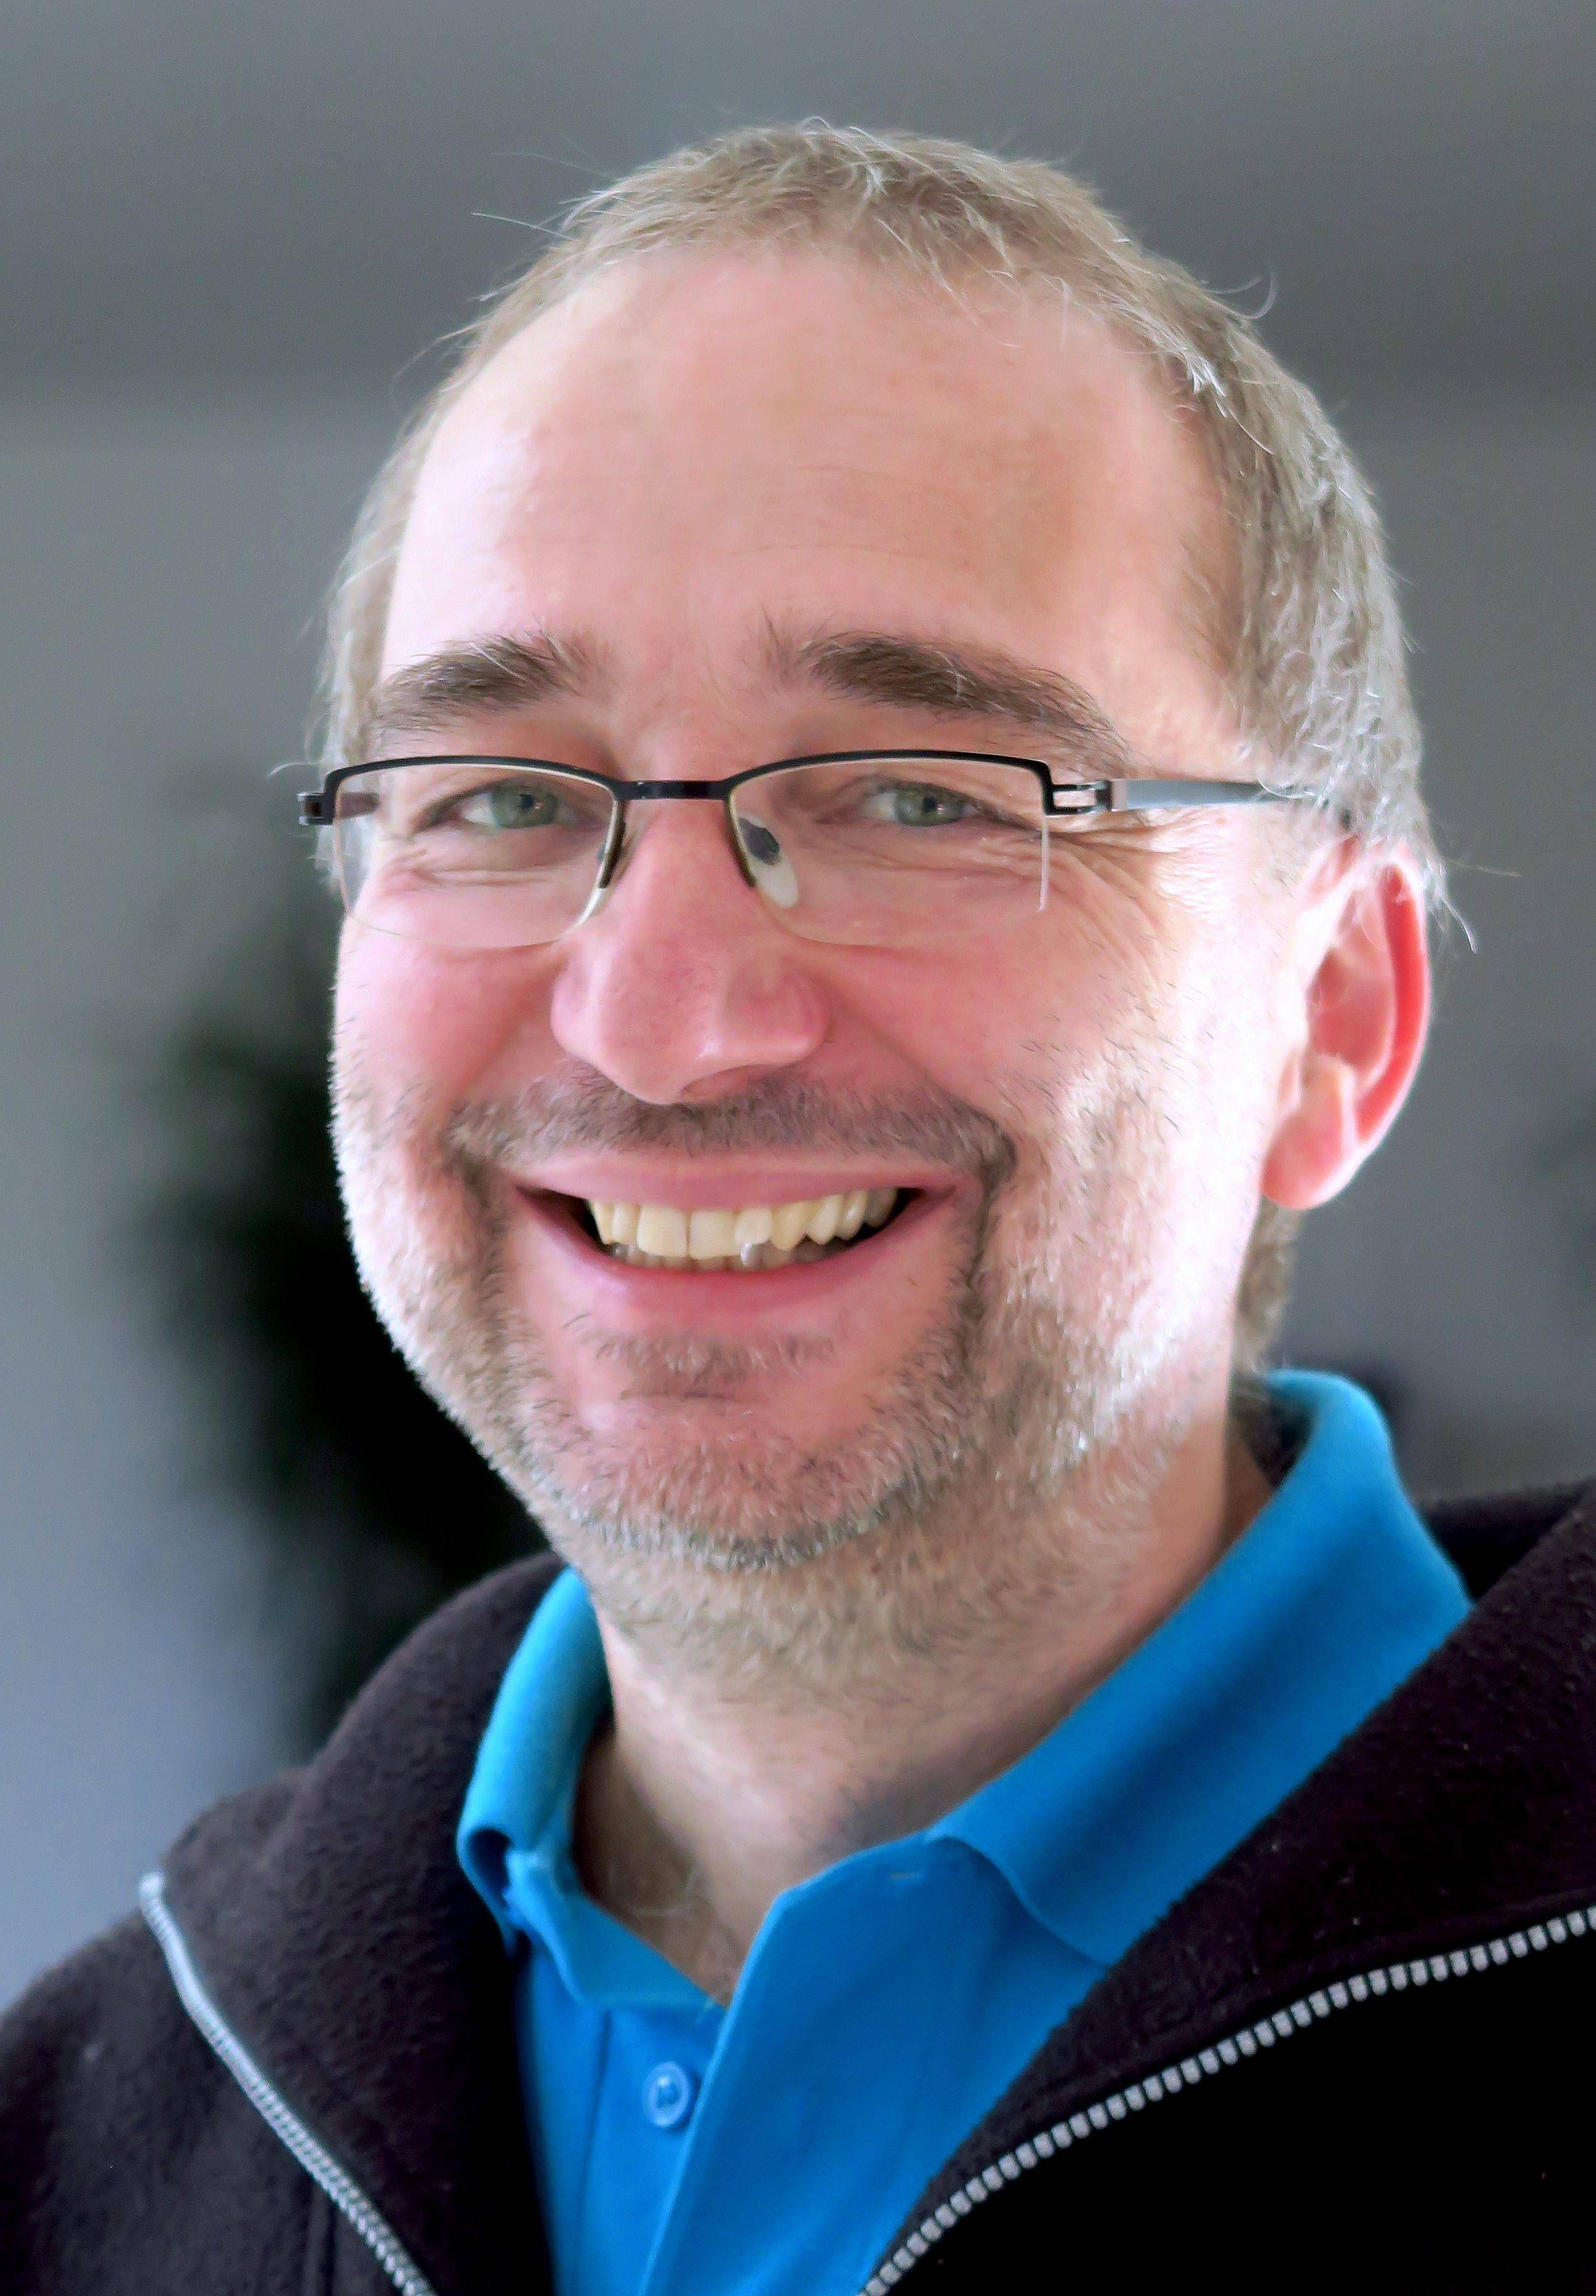 Professor Dr. Stefan Silber